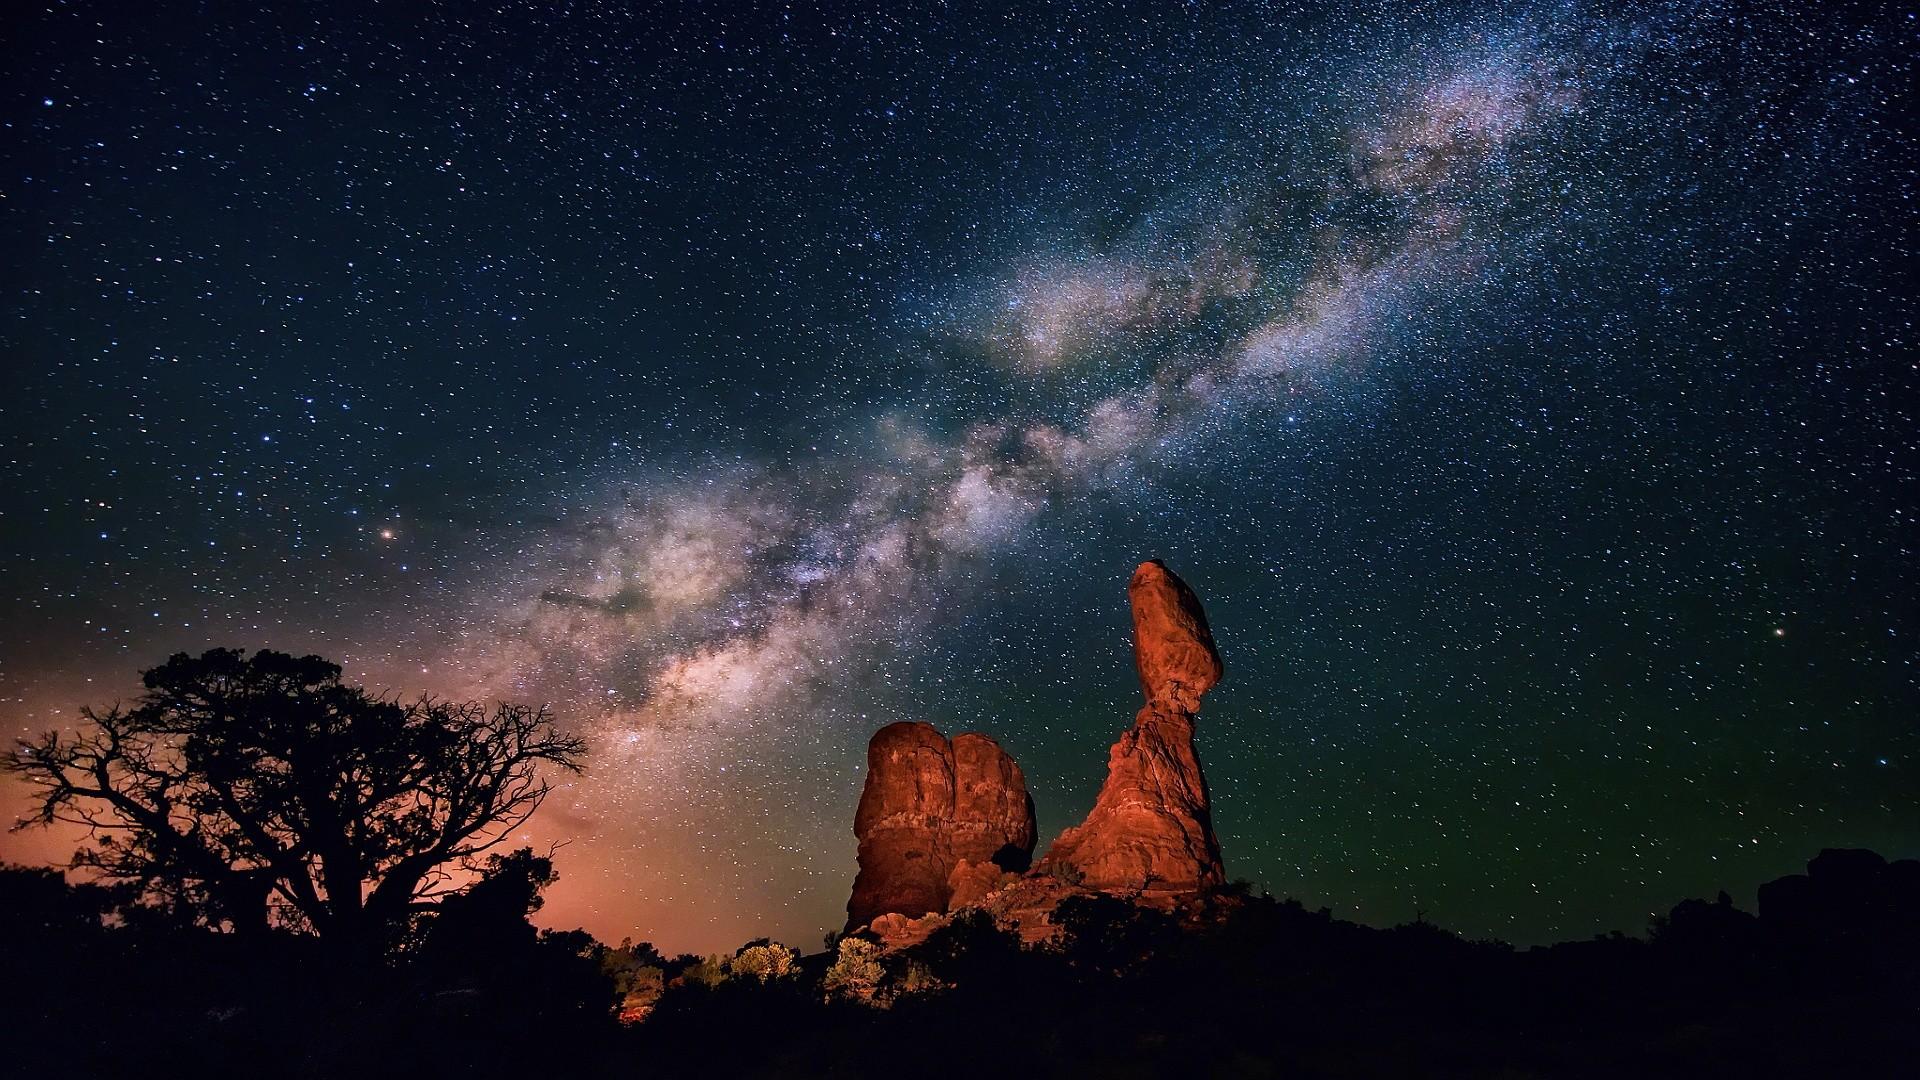 Milky Way HD Wallpapers